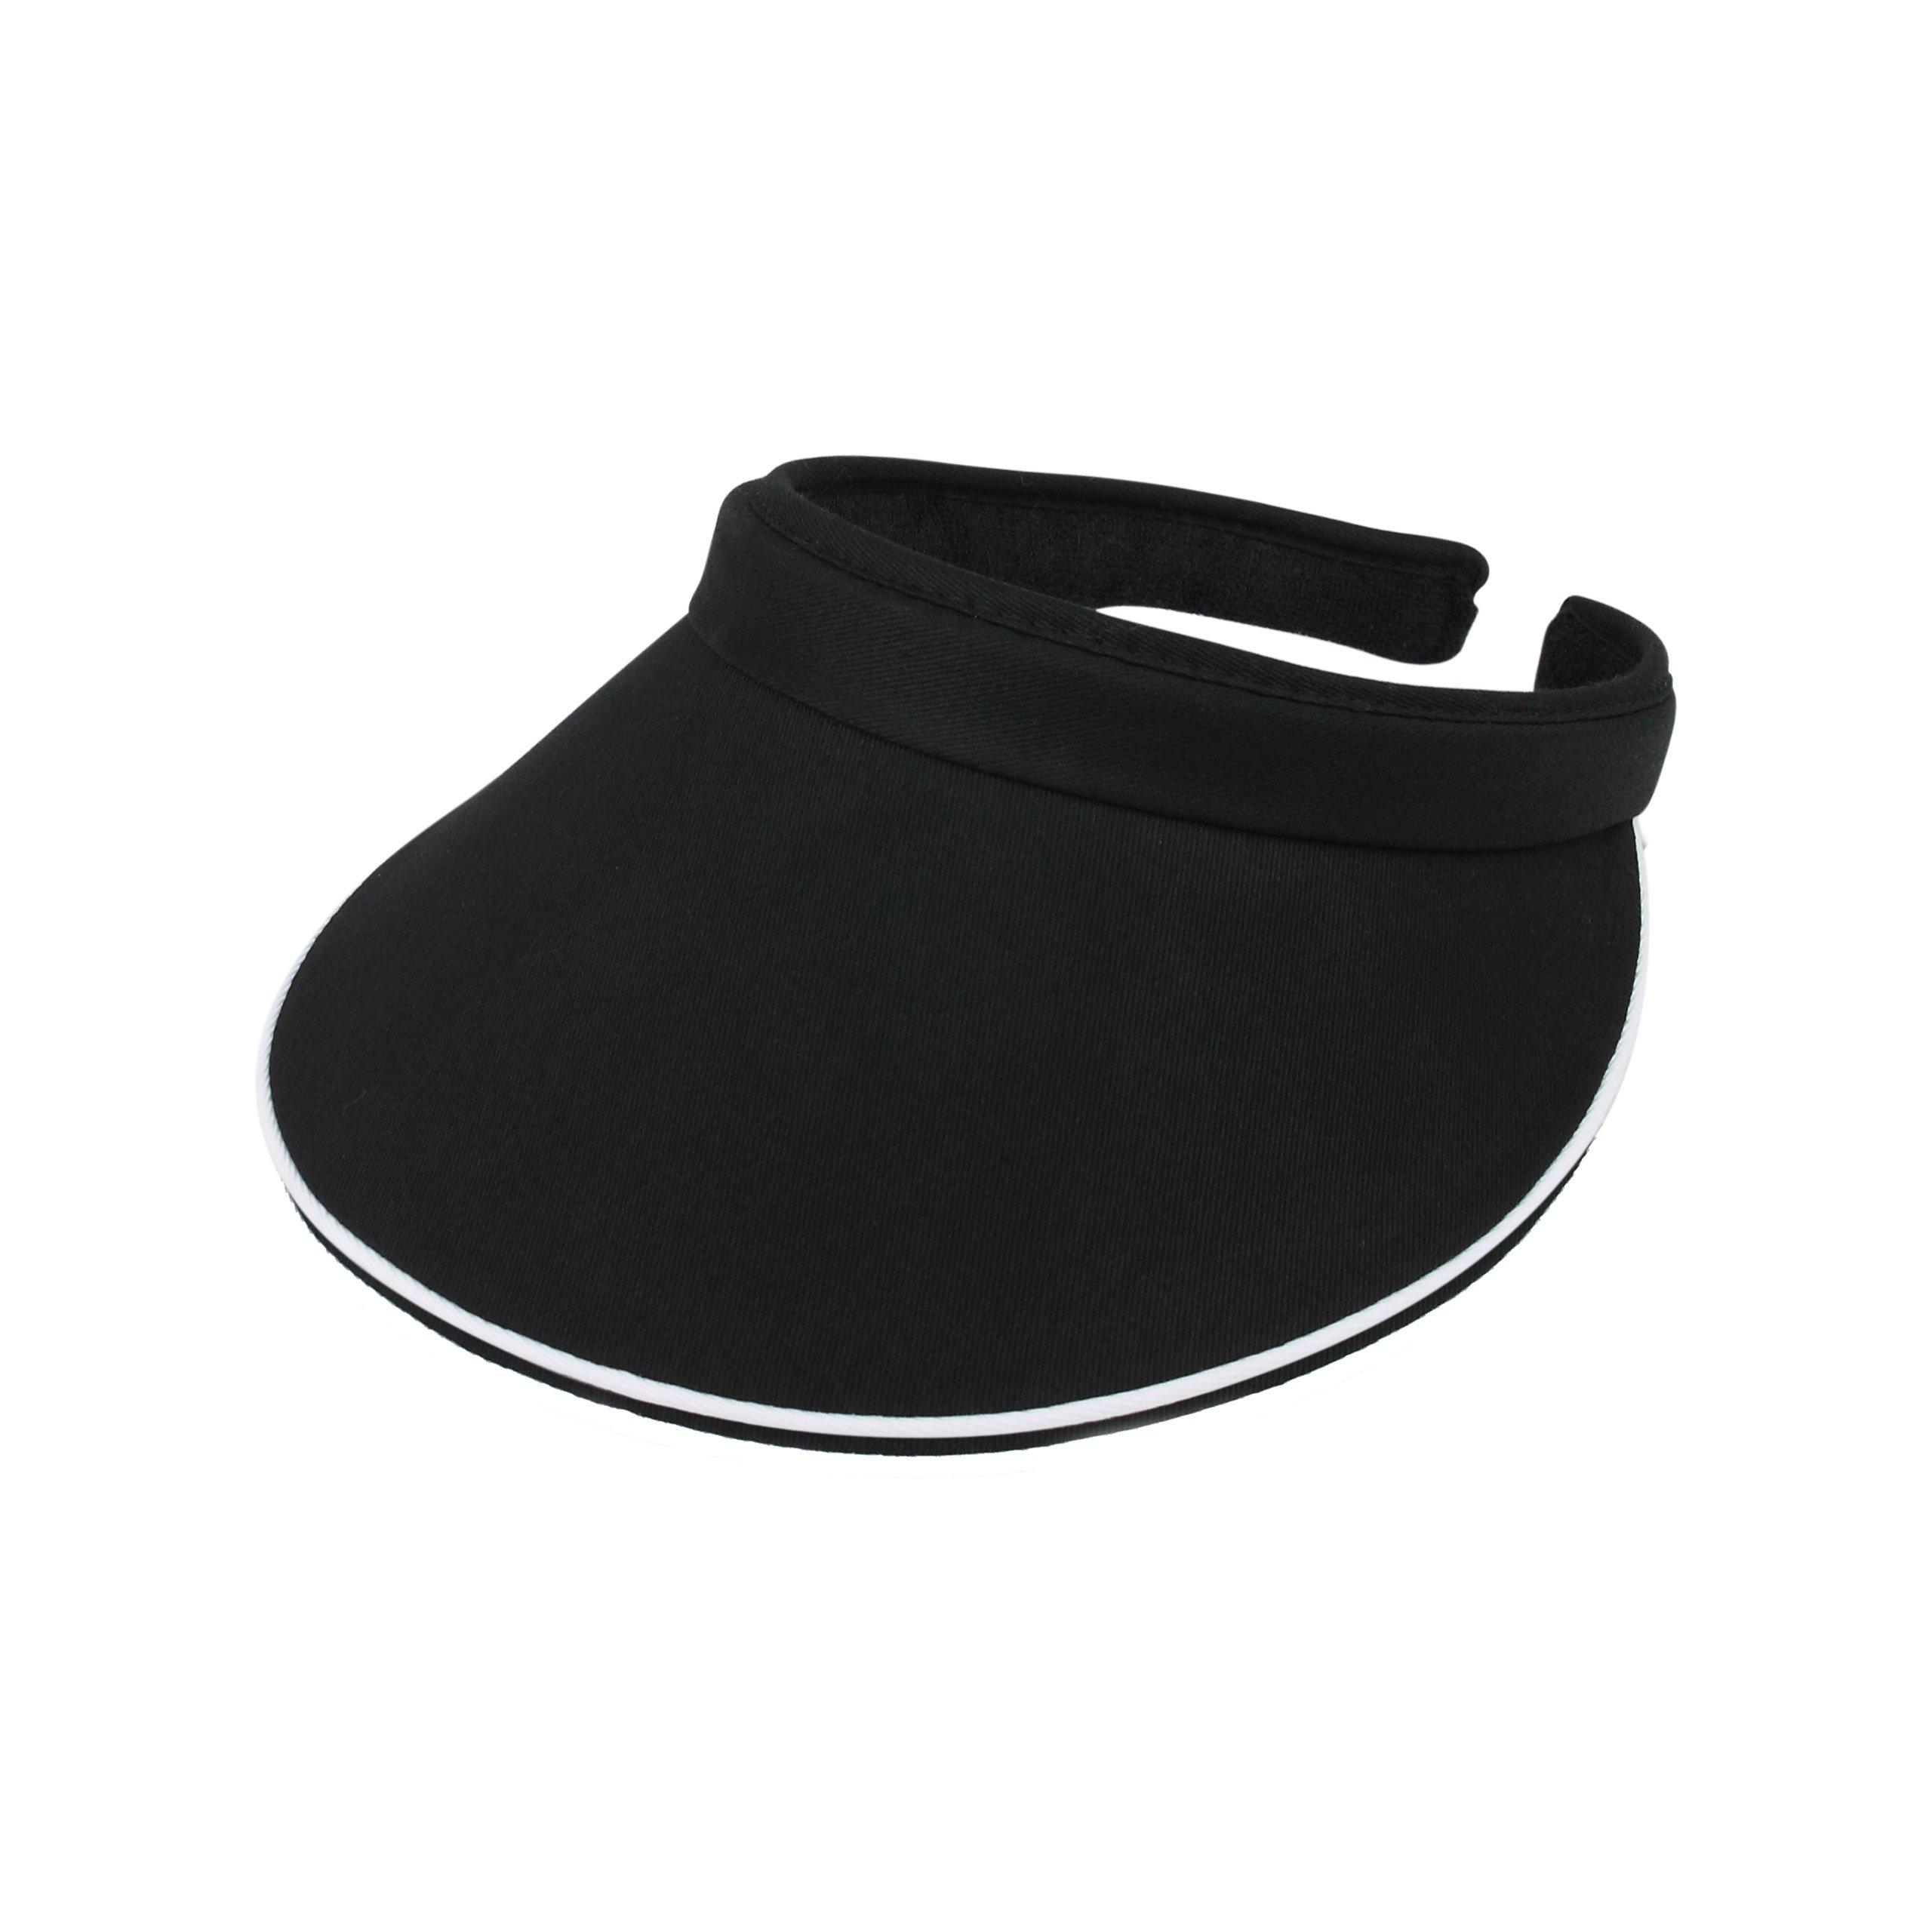 MG Women's Cotton Twill Clip-On Visor-4115